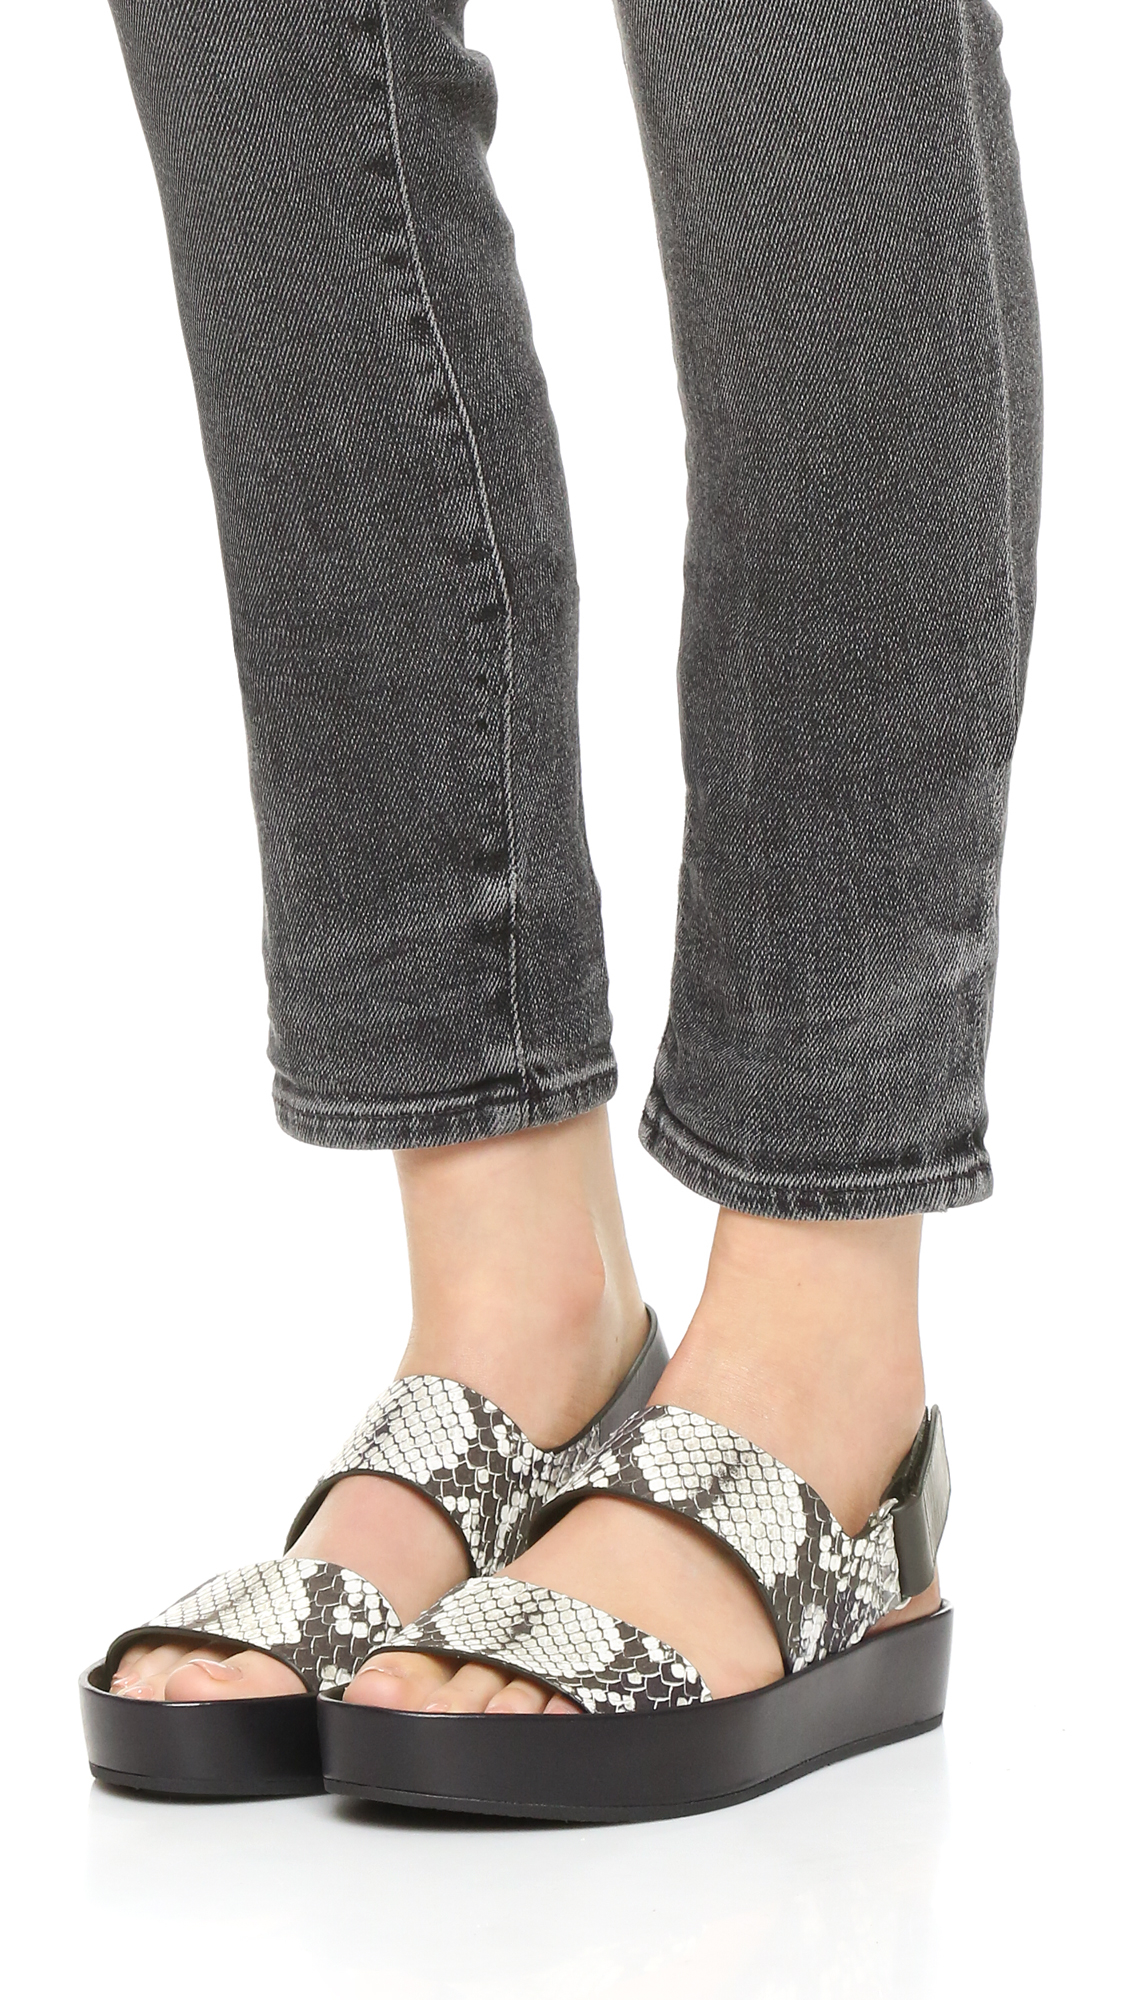 fcdf854f737 Vince Marett Flatform Sandals in Black - Lyst